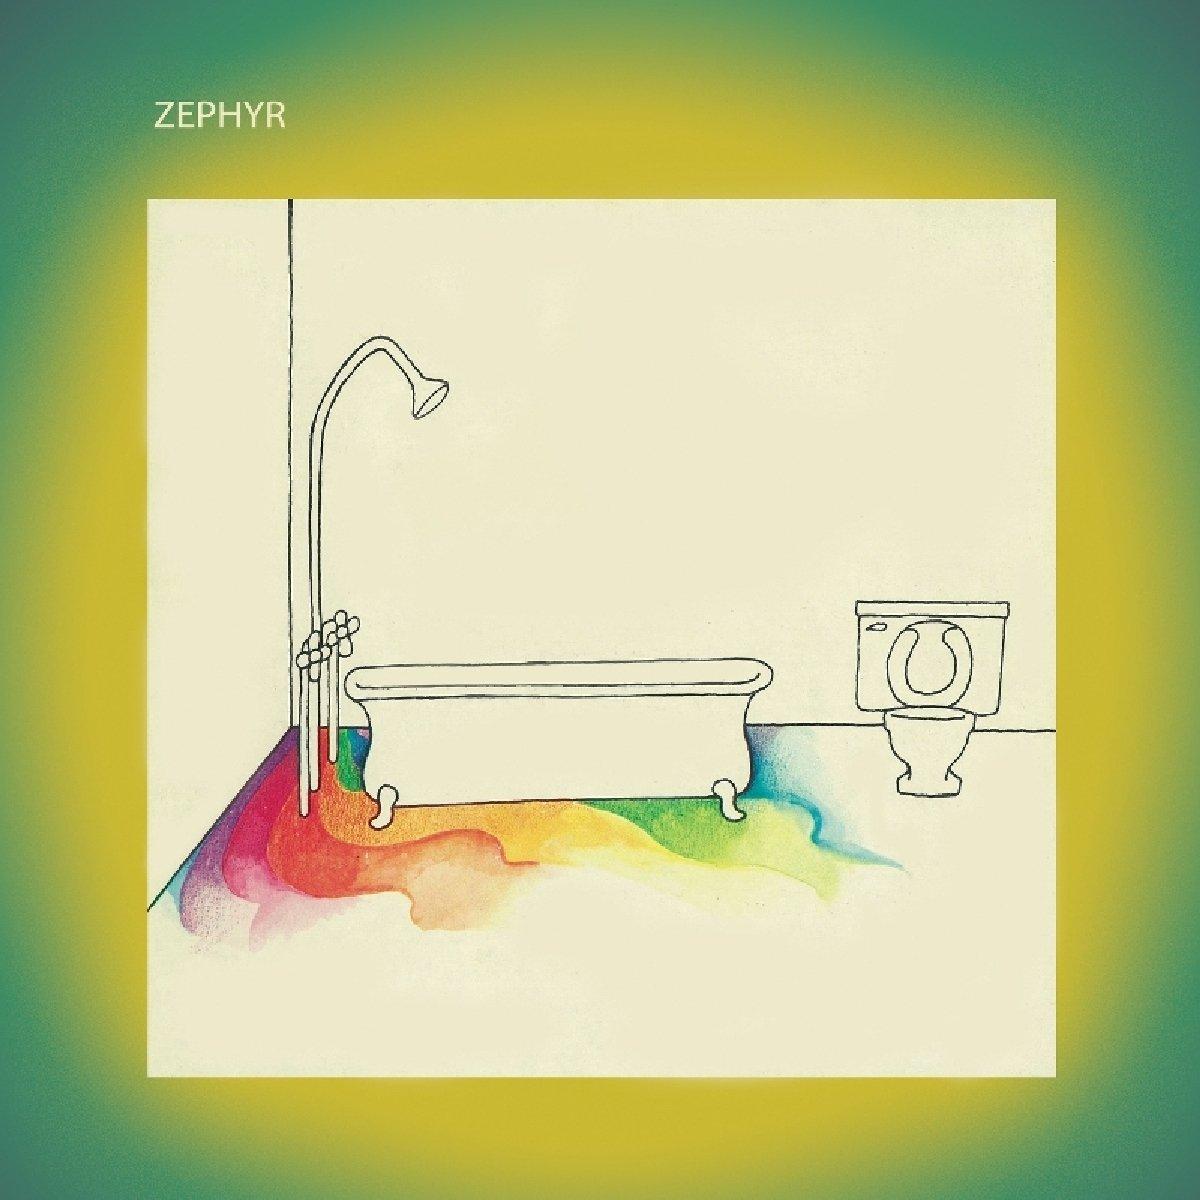 Vinilo : Zephyr - Zephyr (LP Vinyl)